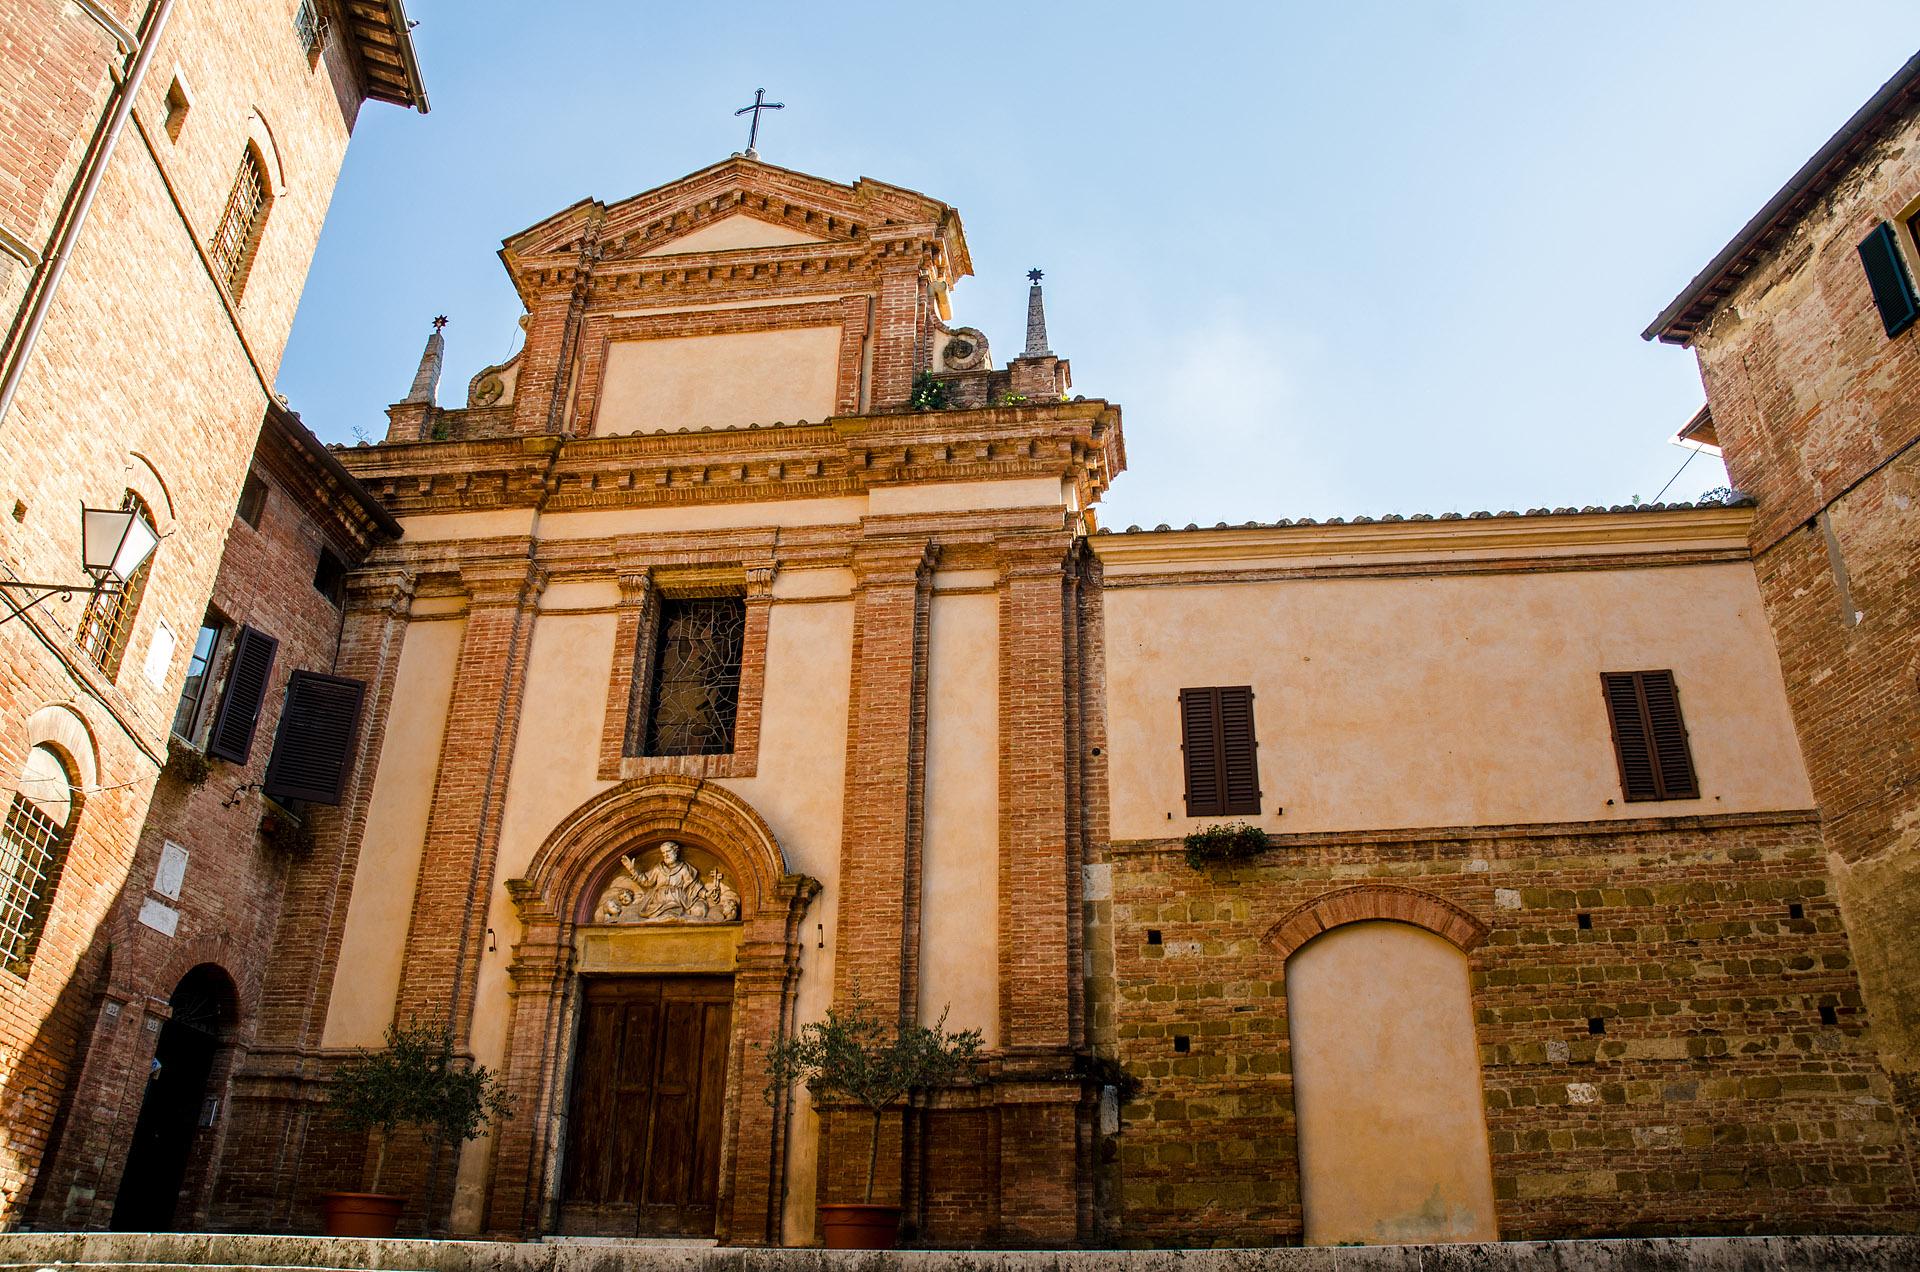 Church of San Pietro alle Scale